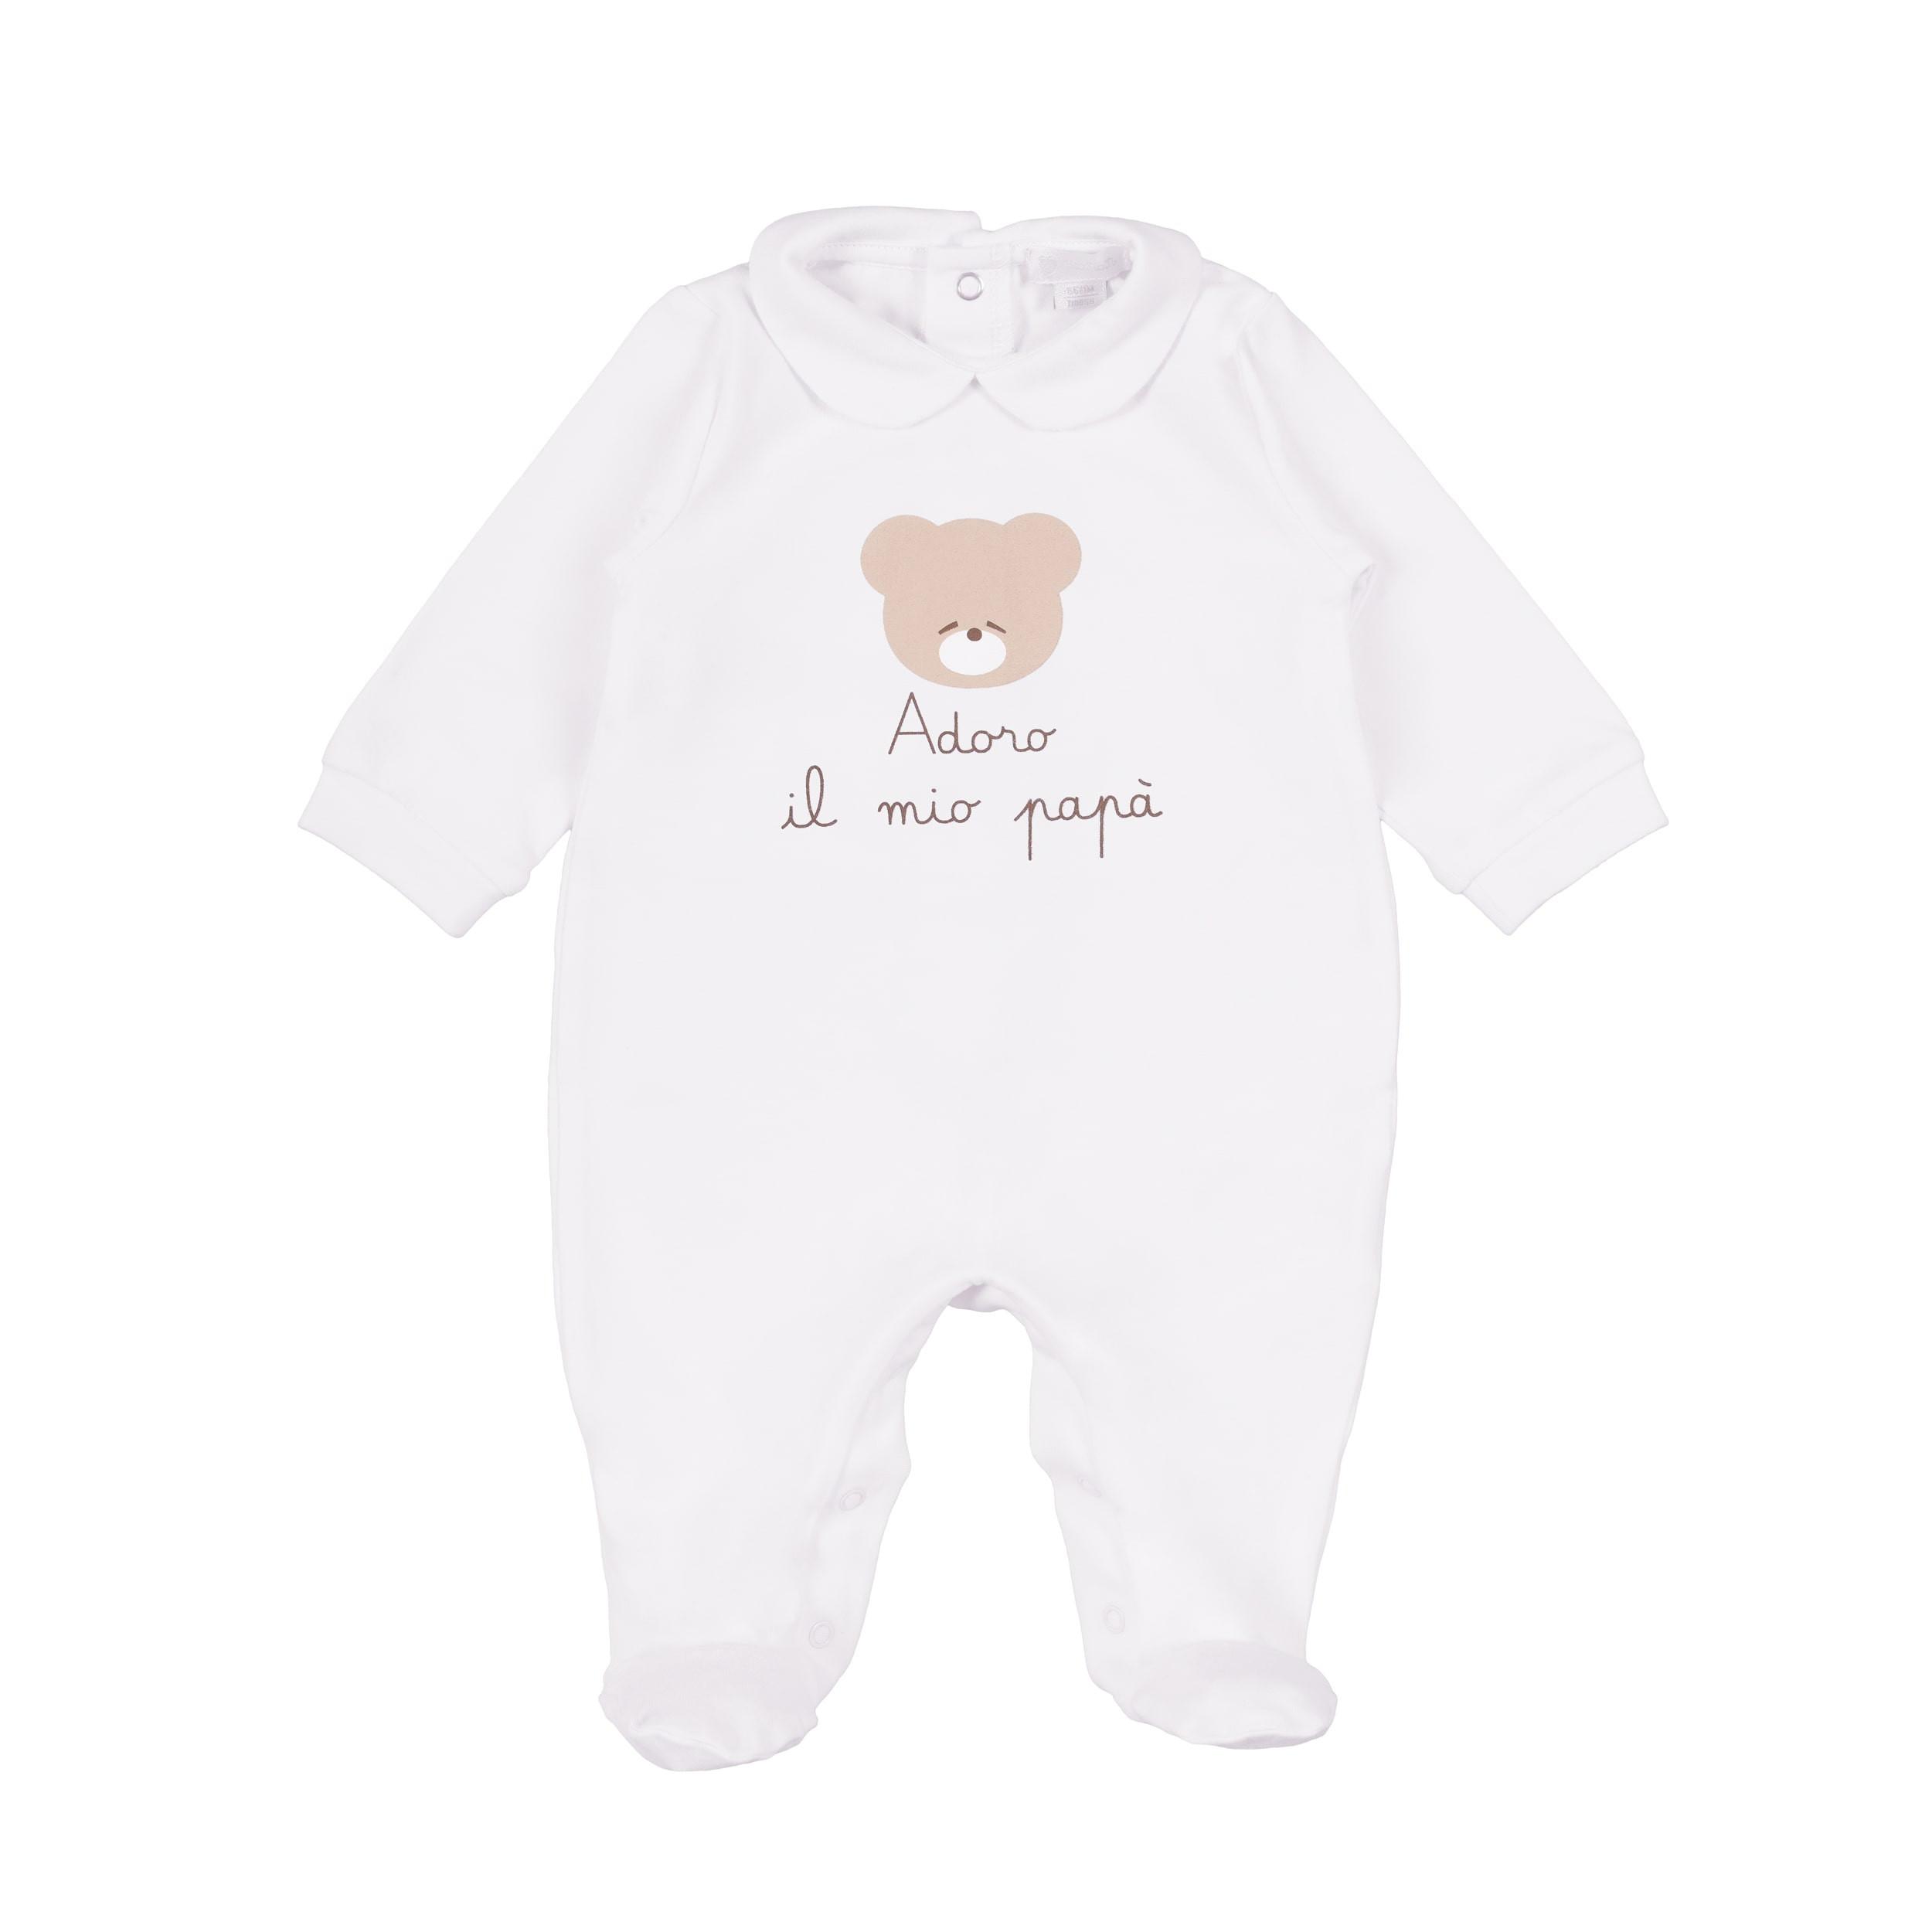 Pyjama - Adoro il mio papà 3 Mois